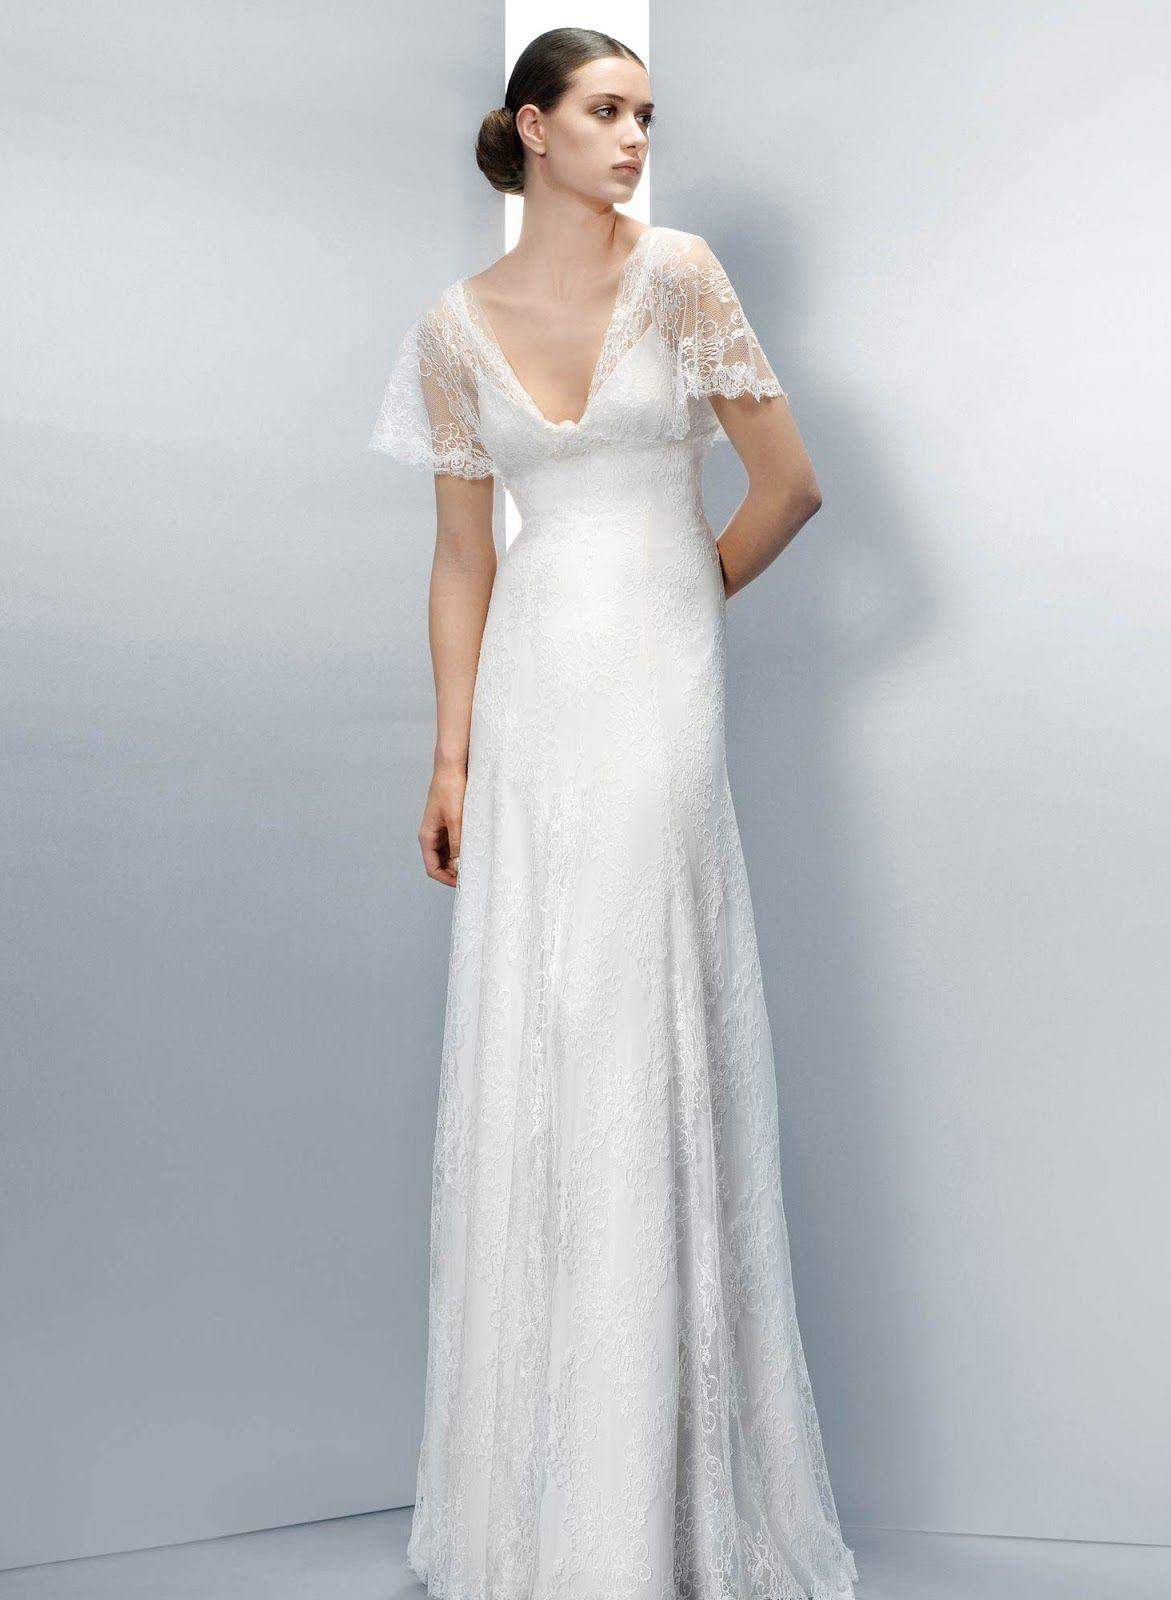 Wedding Dress of the 1940s - PIN Blogger | Dresses | Pinterest